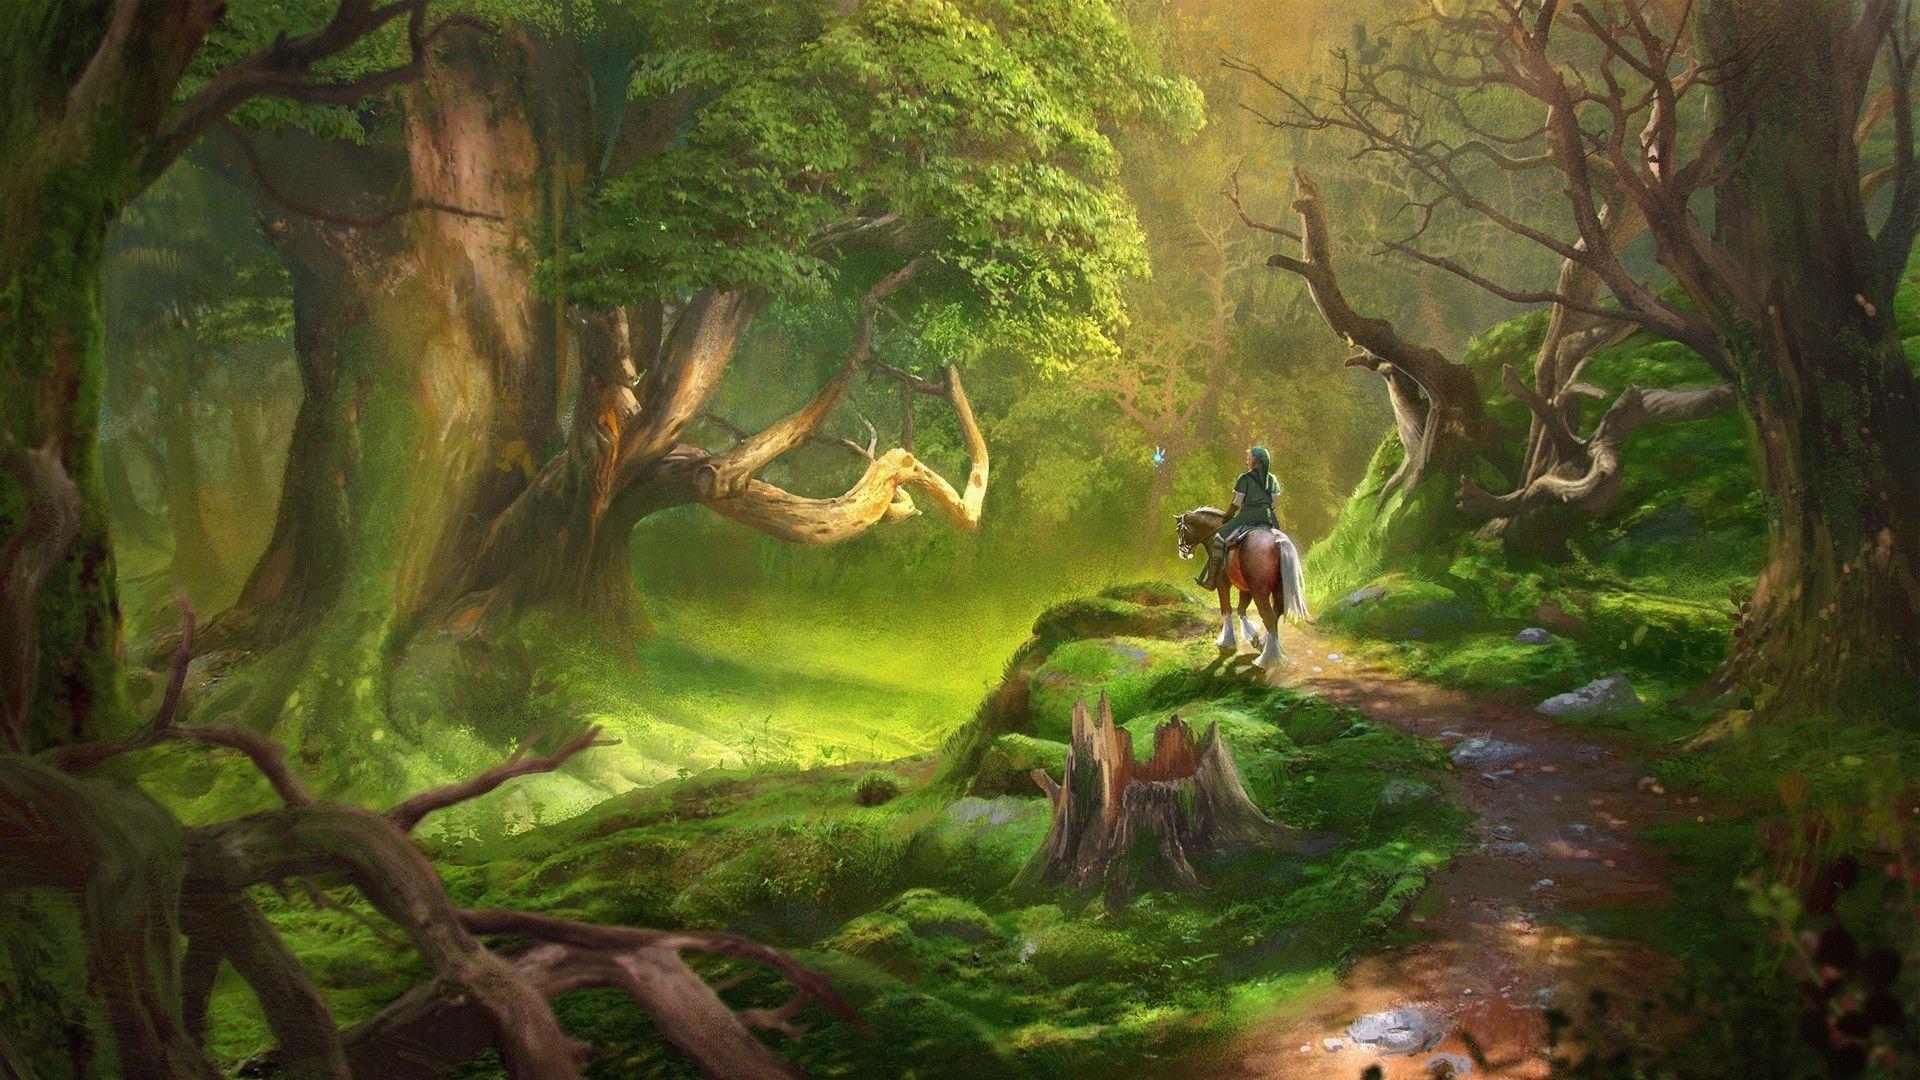 Link, Video Games, The Legend Of Zelda, Forest Wallpapers